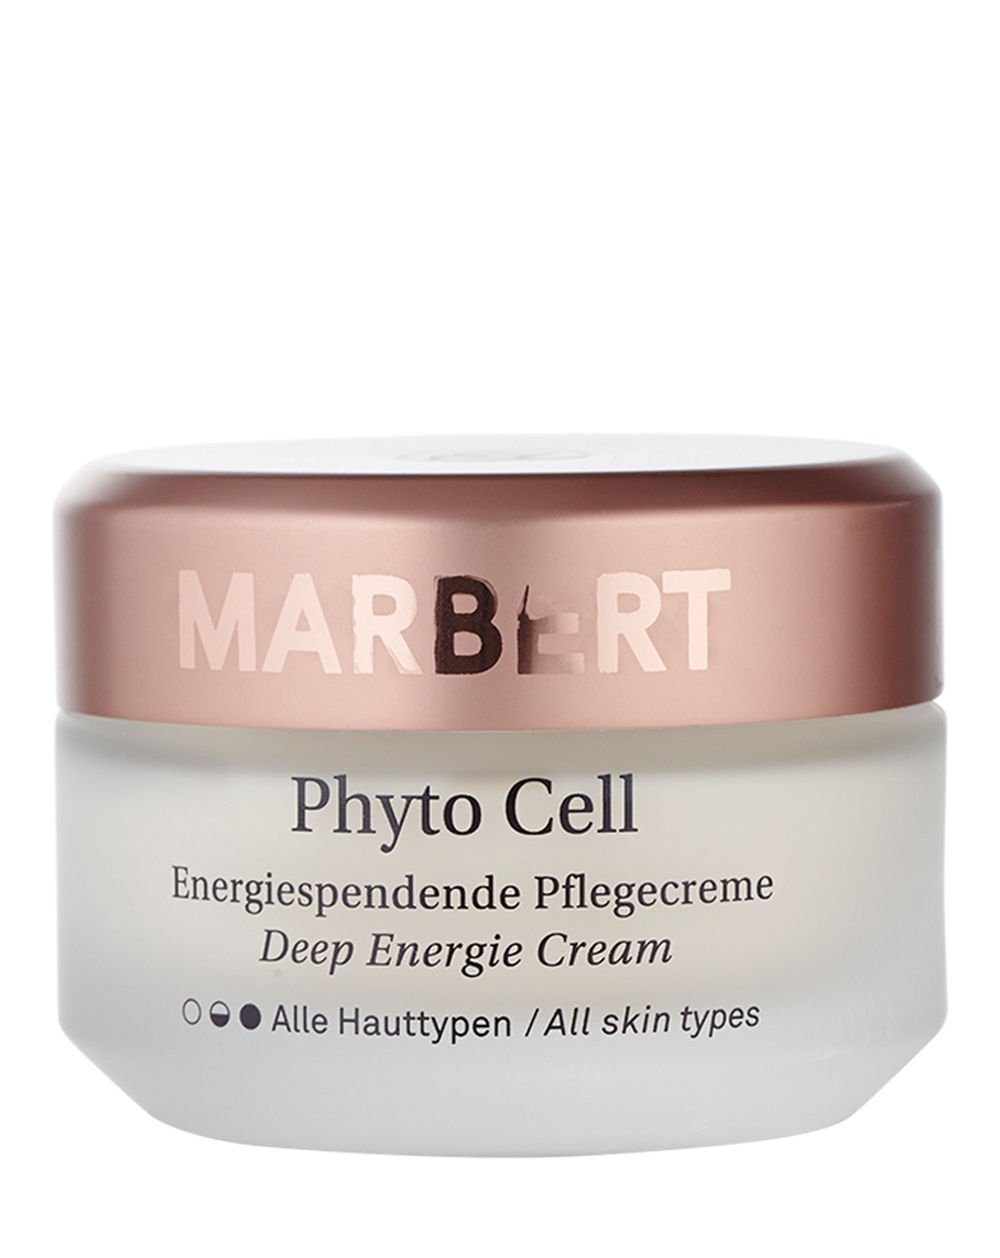 Marbert Feuchtigkeitscreme »Phyto Cell Deep Energy Cream«